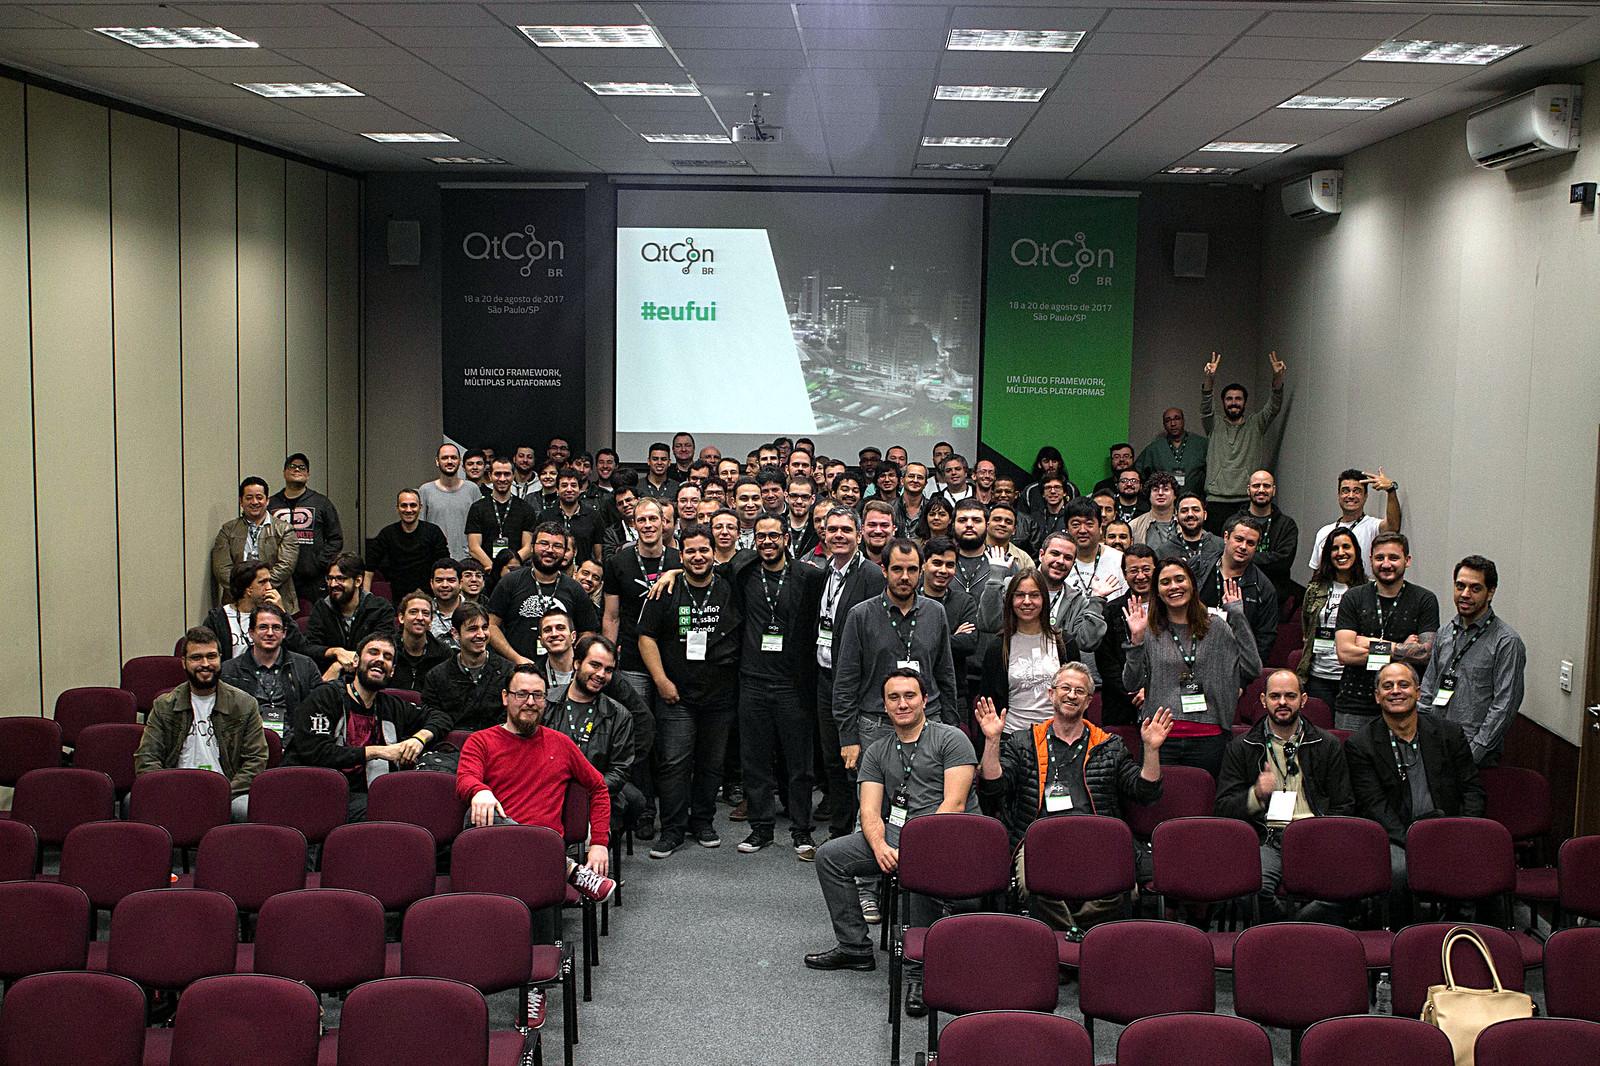 QtCon Brazil 2017